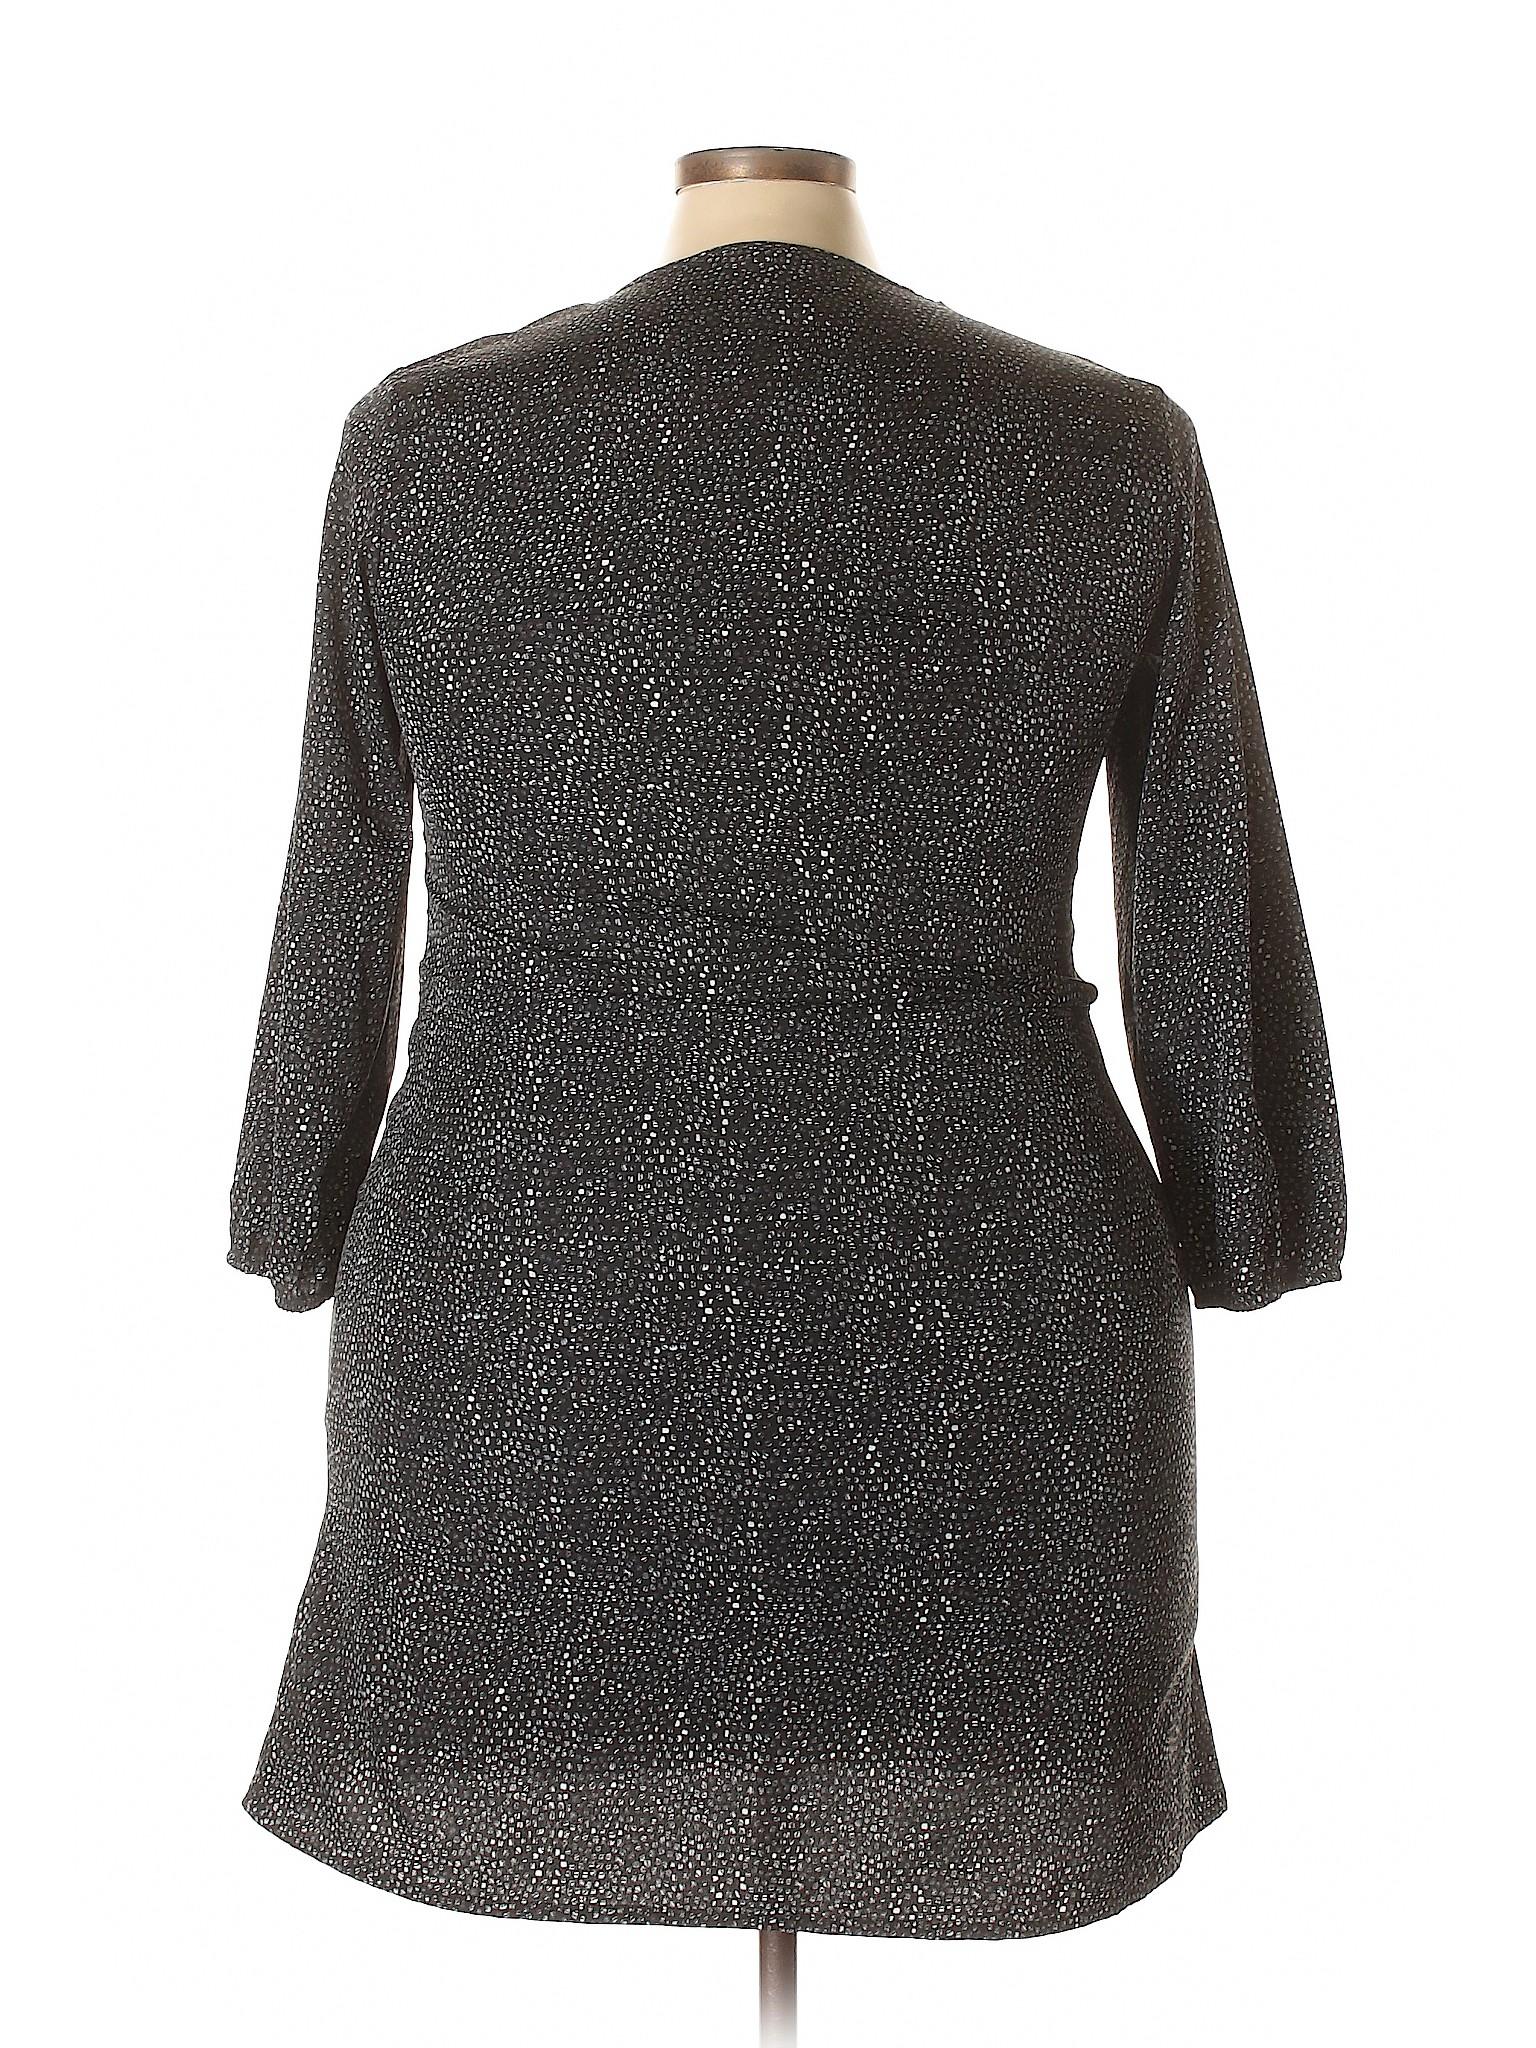 amp;M Dress Boutique winter Casual H PBBrnqEvI